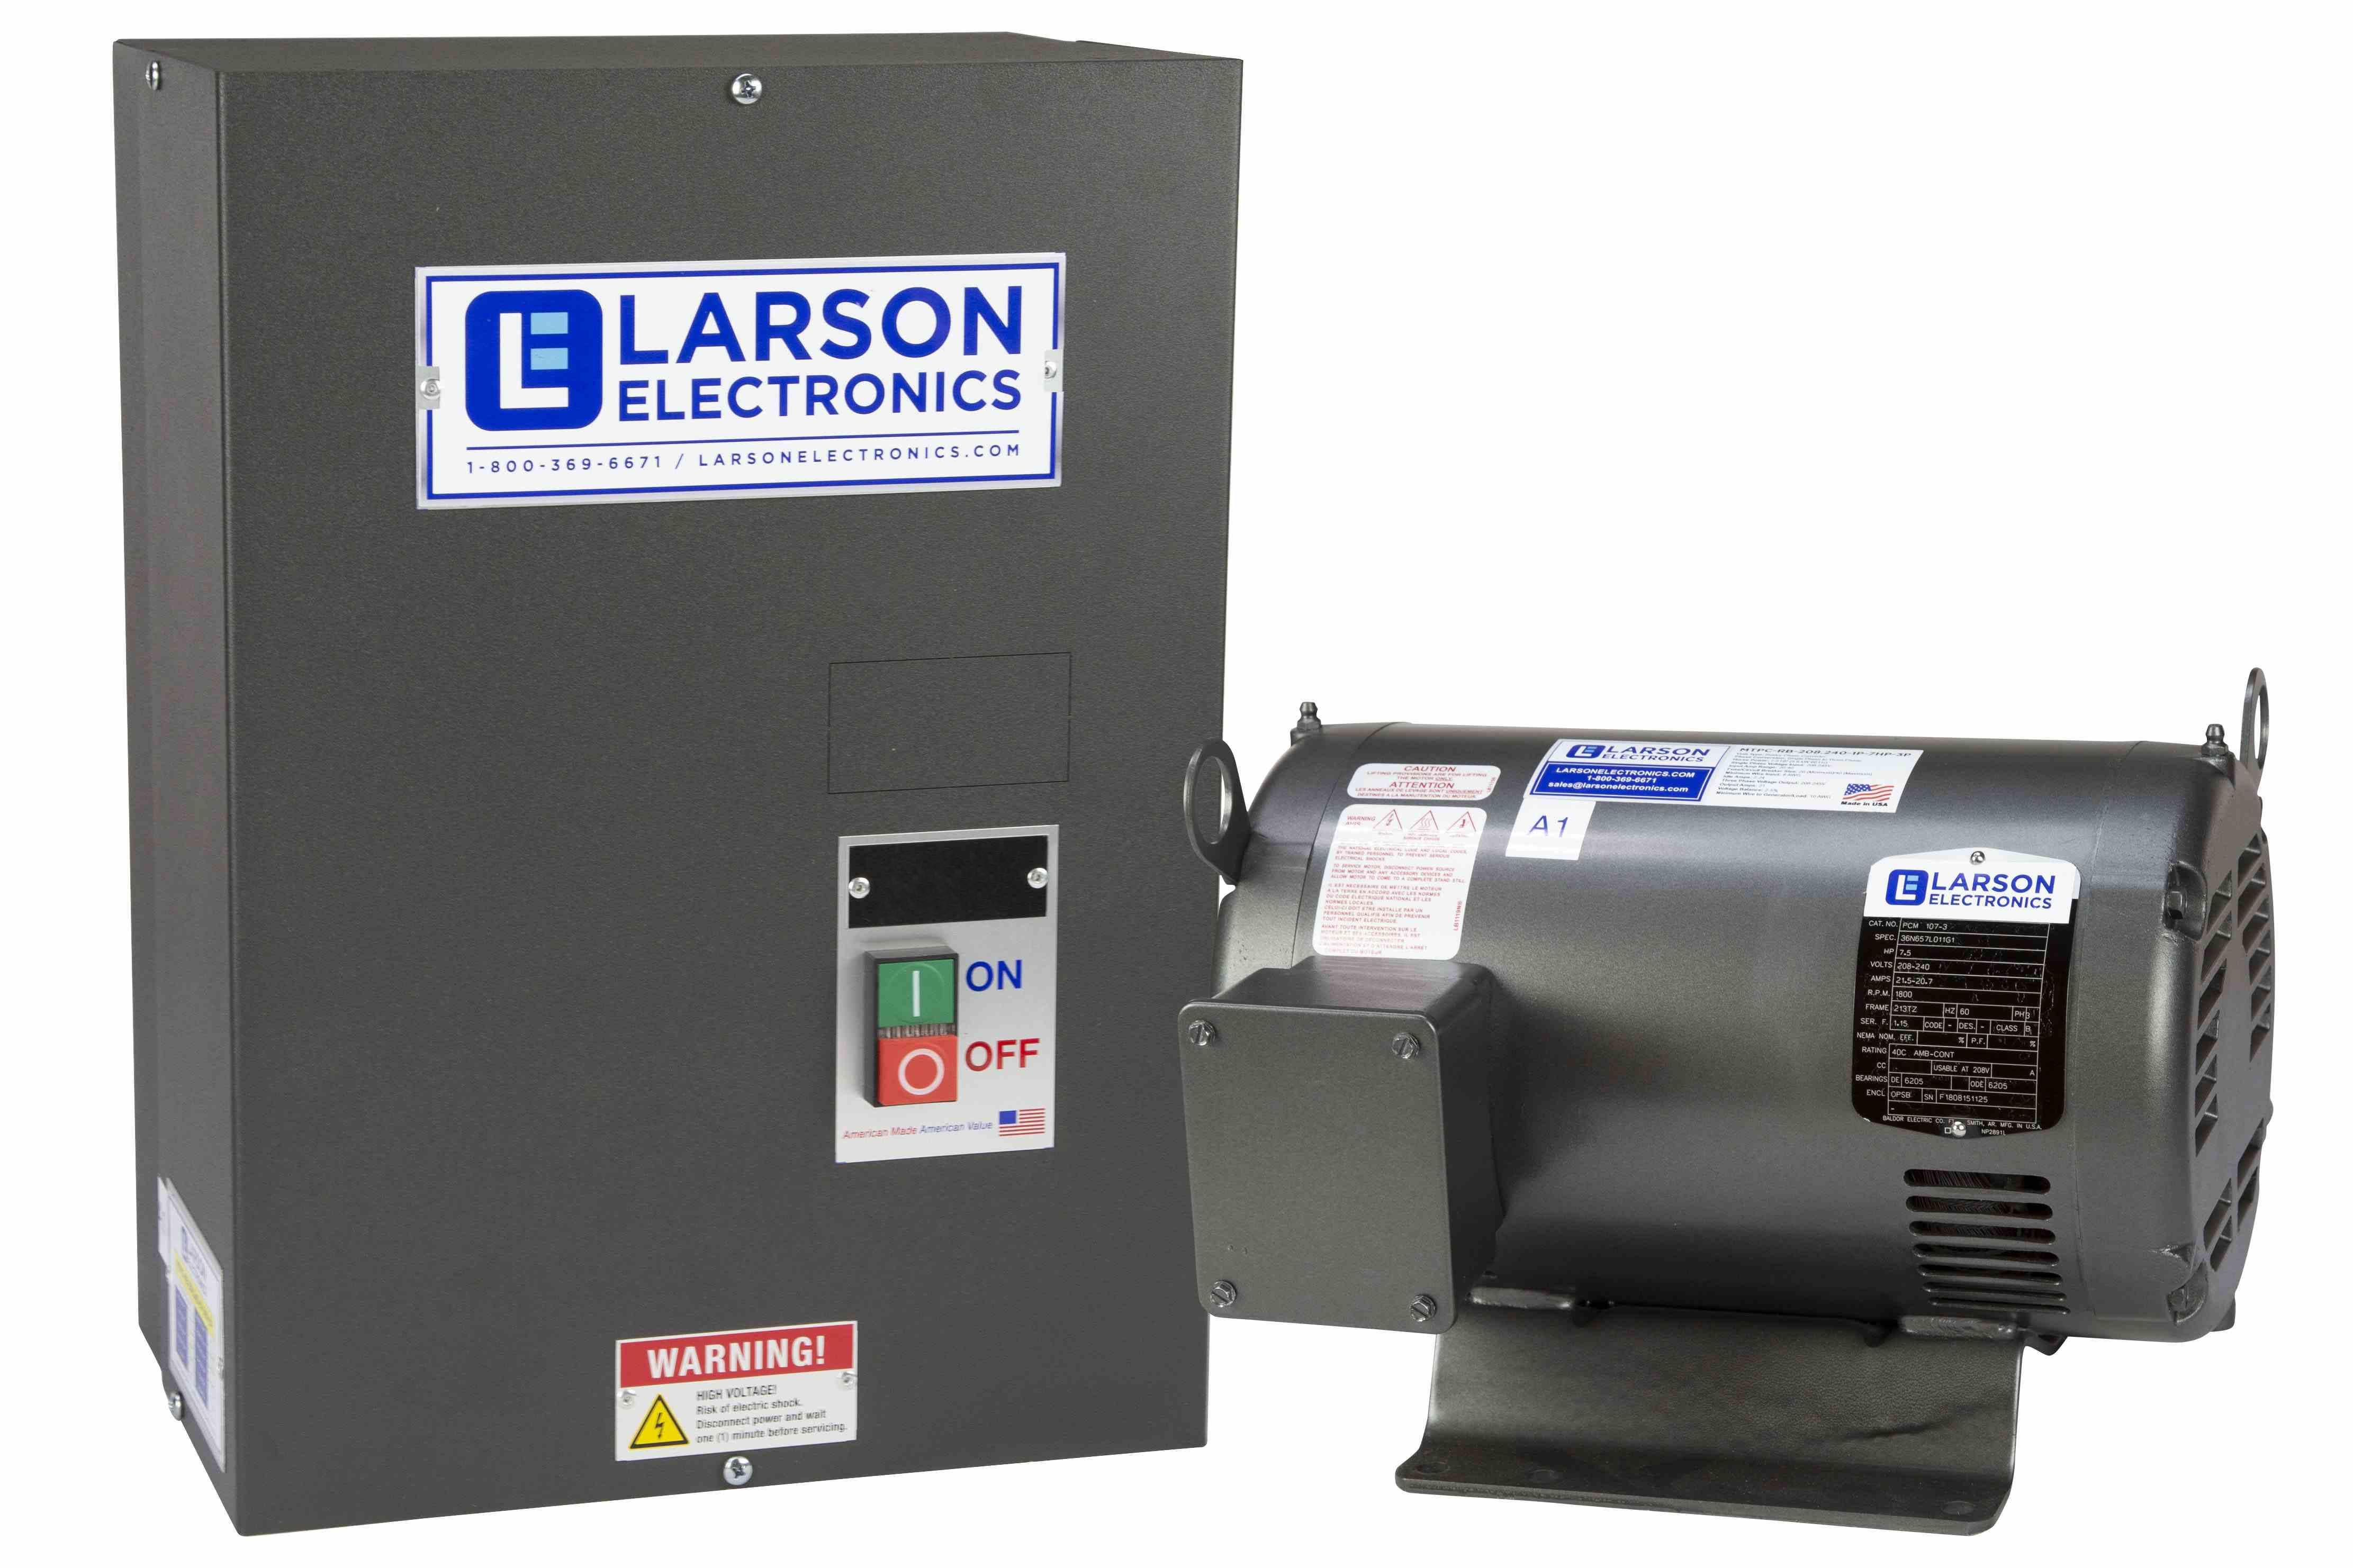 Rotary Phase Converter for 15HP Medium Loads, 220V 1PH to 3PH, 42.9 Amps Output, 25HP Idler, NEMA 1